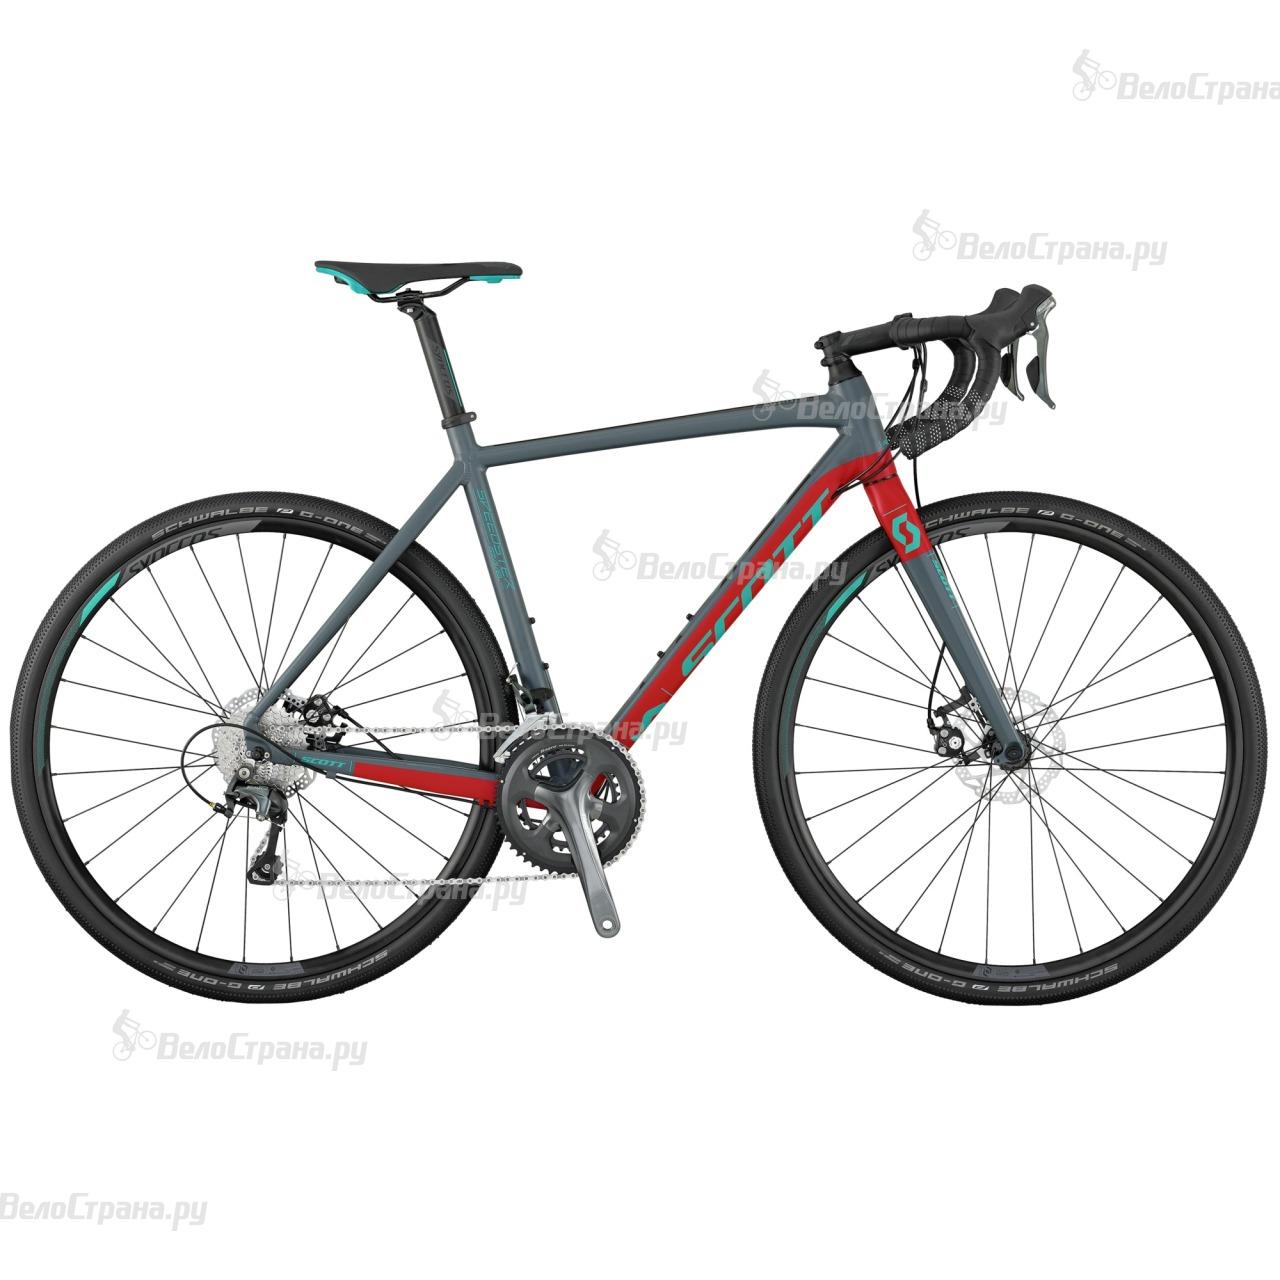 Велосипед Scott Speedster Gravel 20 Disc (2017) велосипед scott speedster cx 20 disc 28 2016